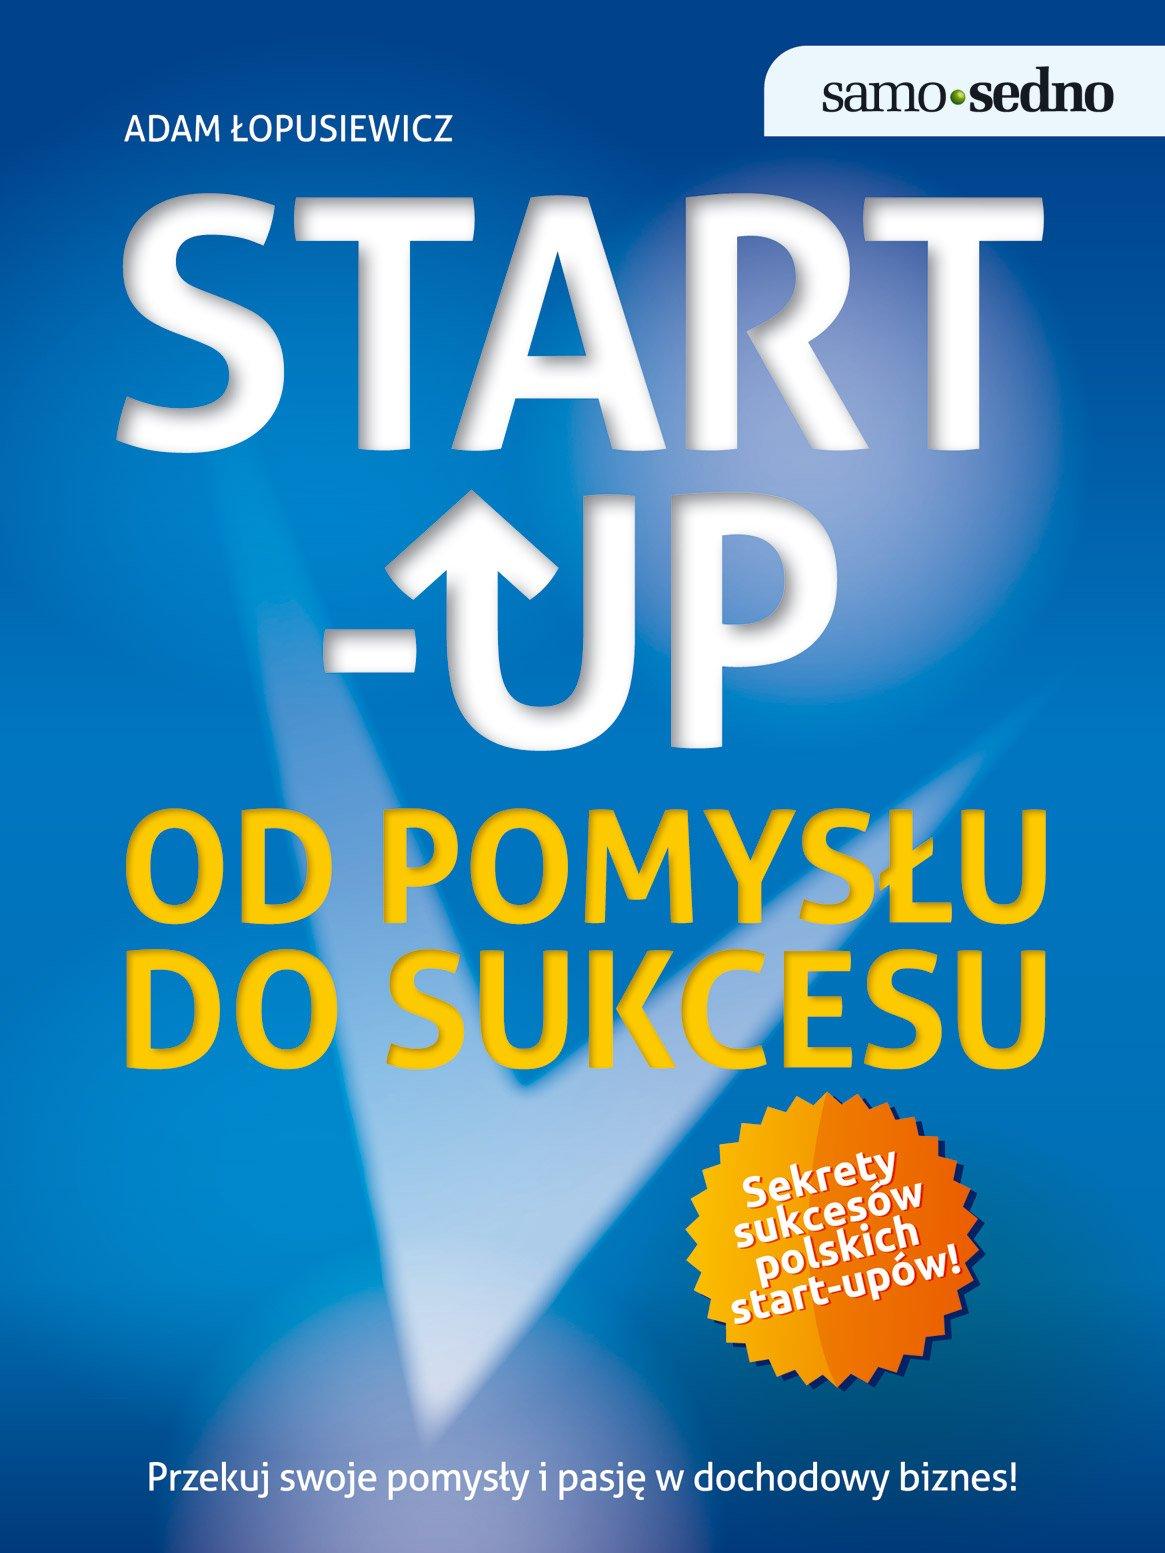 Samo Sedno. Start-up. Od pomysłu do sukcesu - Ebook (Książka na Kindle) do pobrania w formacie MOBI